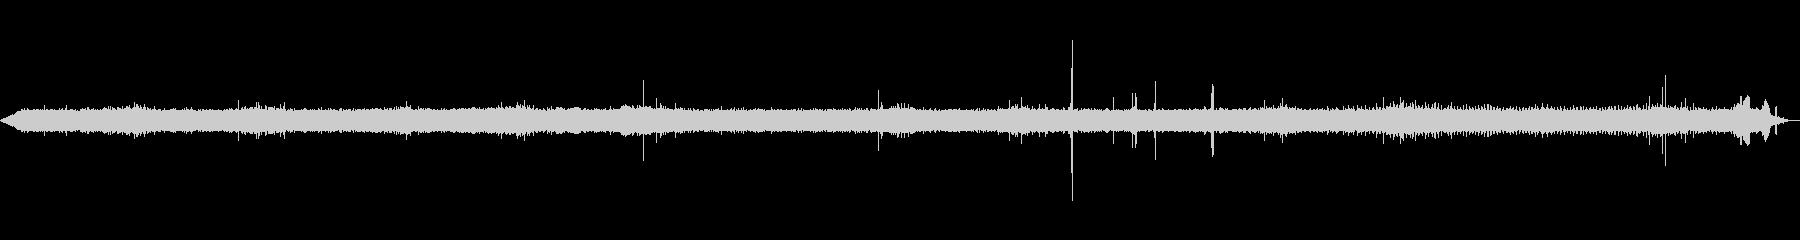 [ASMR]昆虫などが鳴いている森_07の未再生の波形